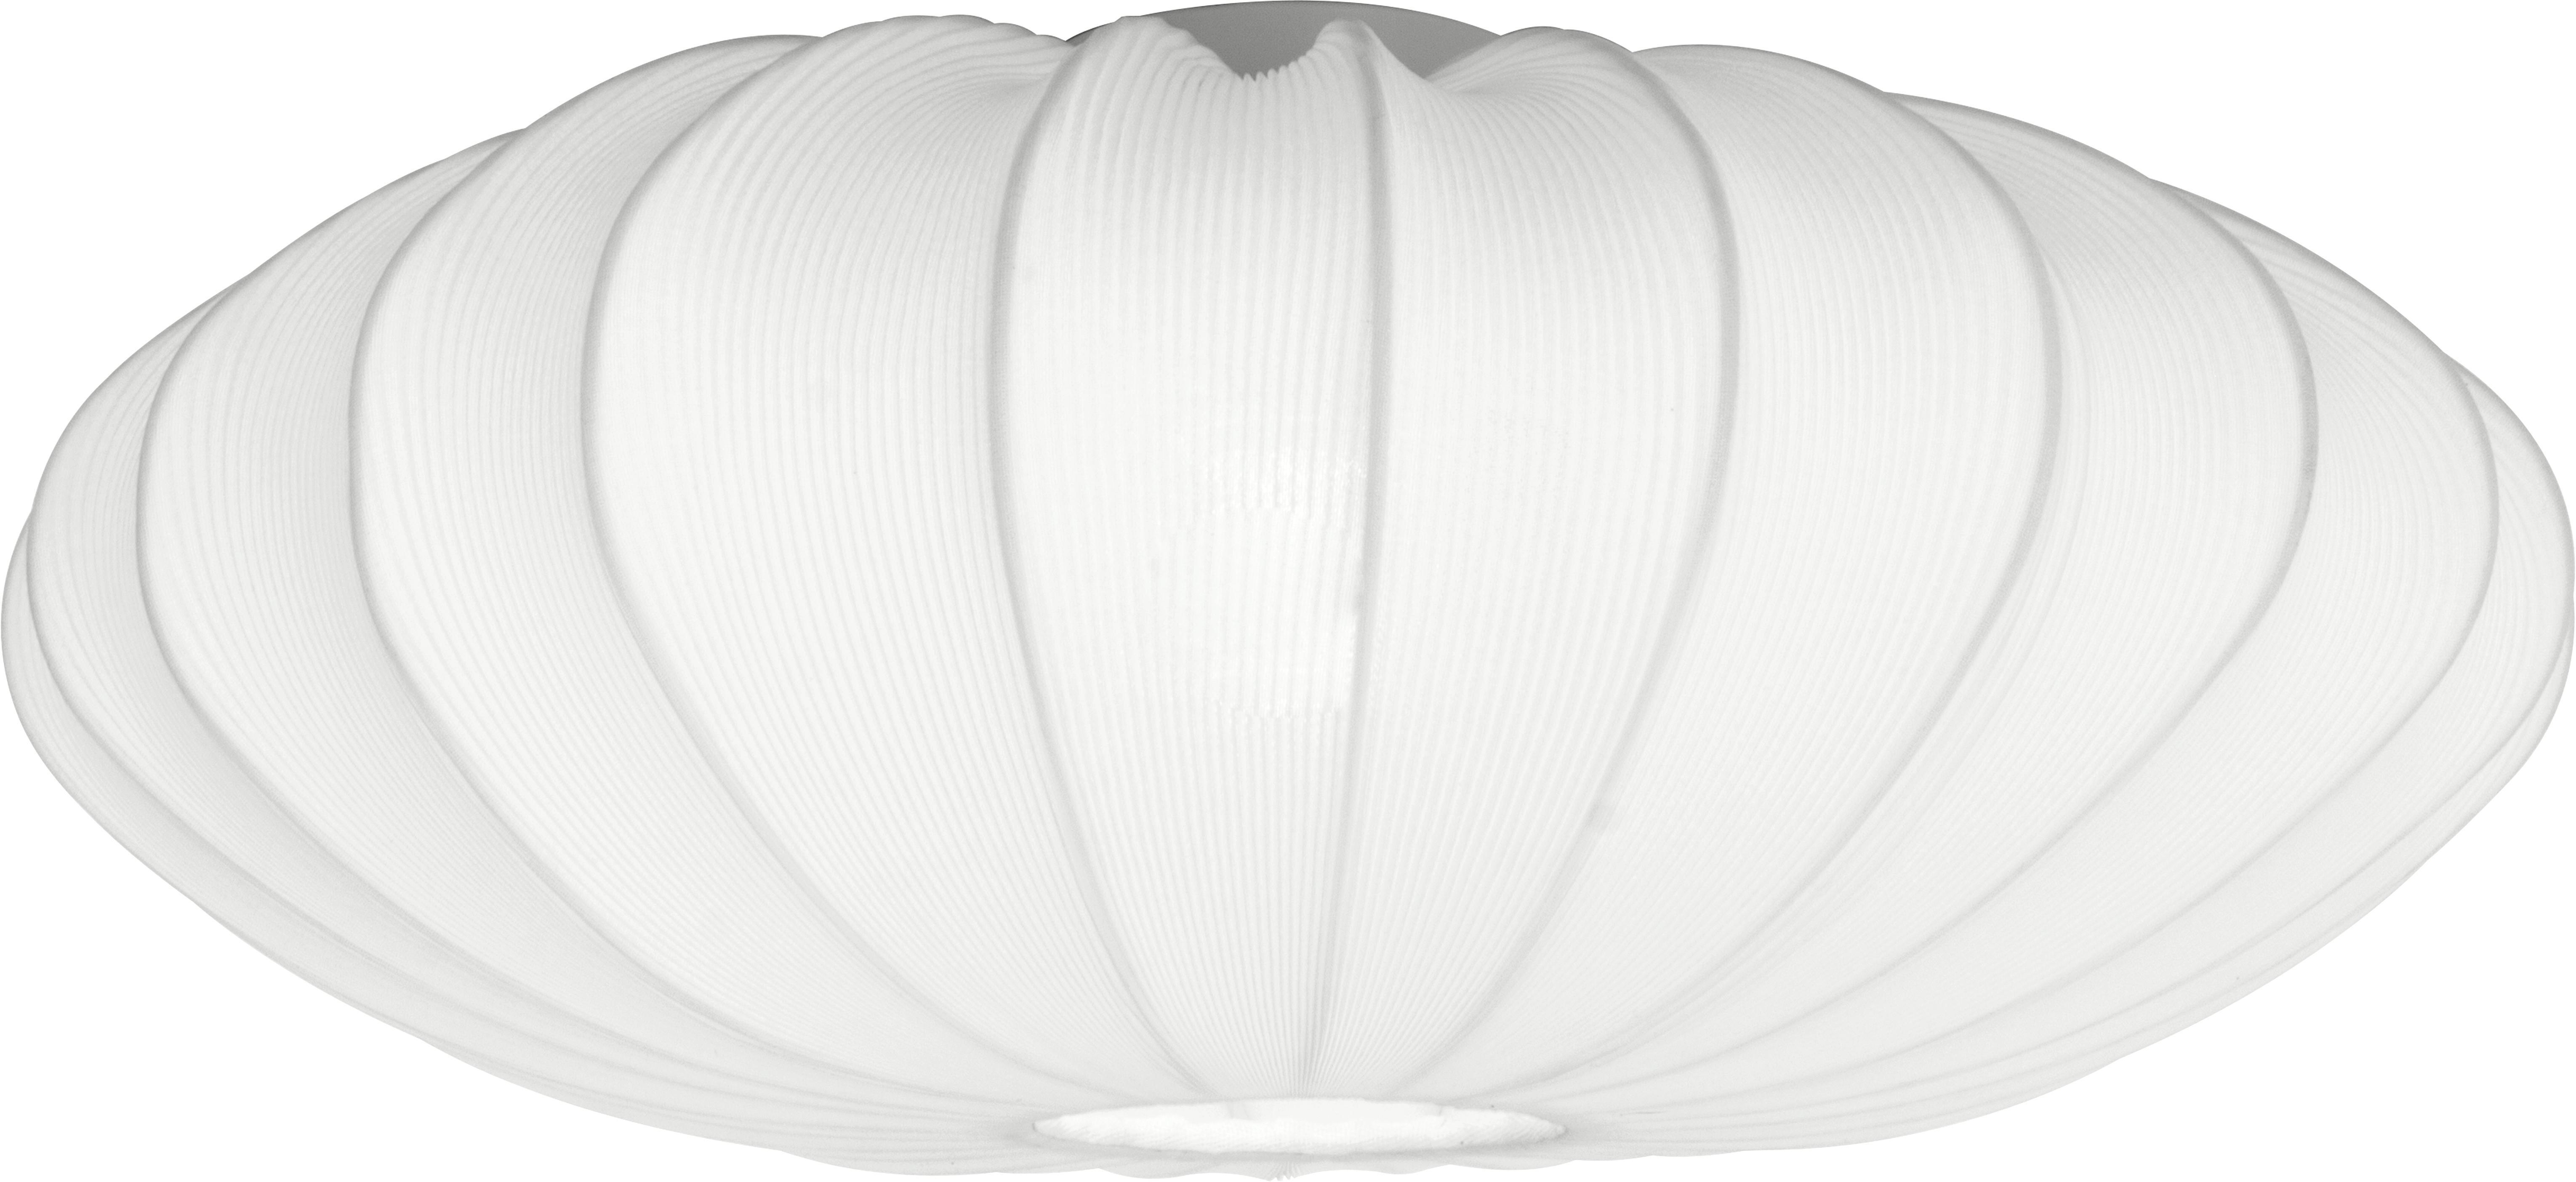 Lampa sufitowa Mamsell, Metal, tkanina, Biały, Ø 65 x W 27 cm